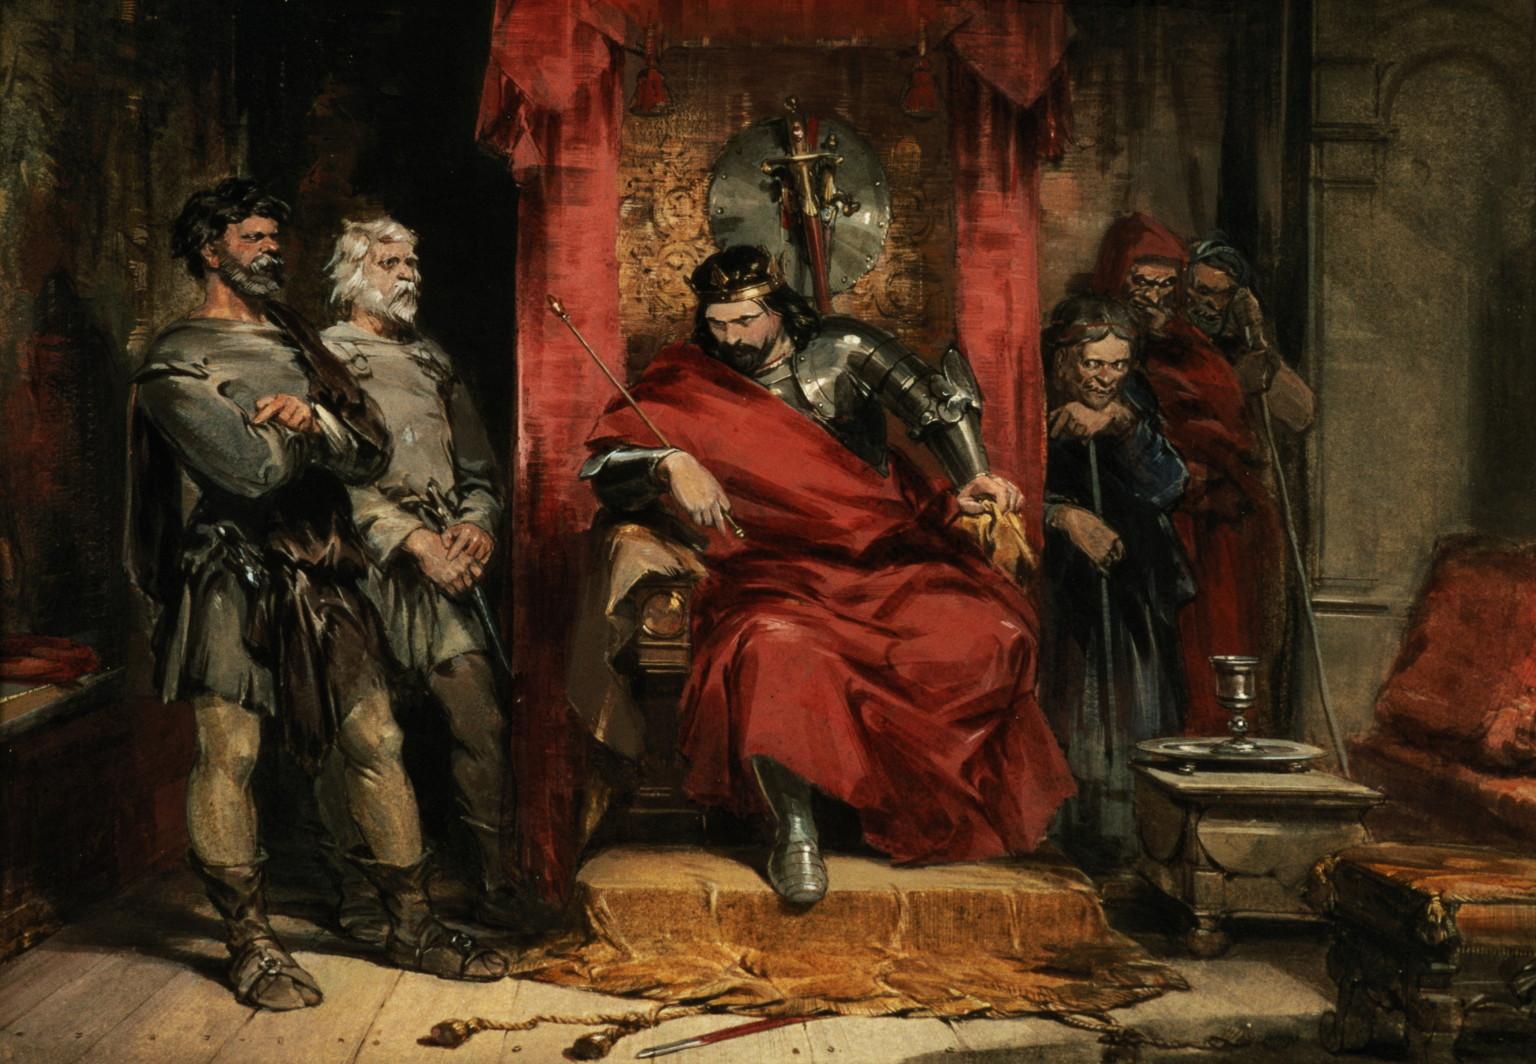 a description of william shakespeares macbeth